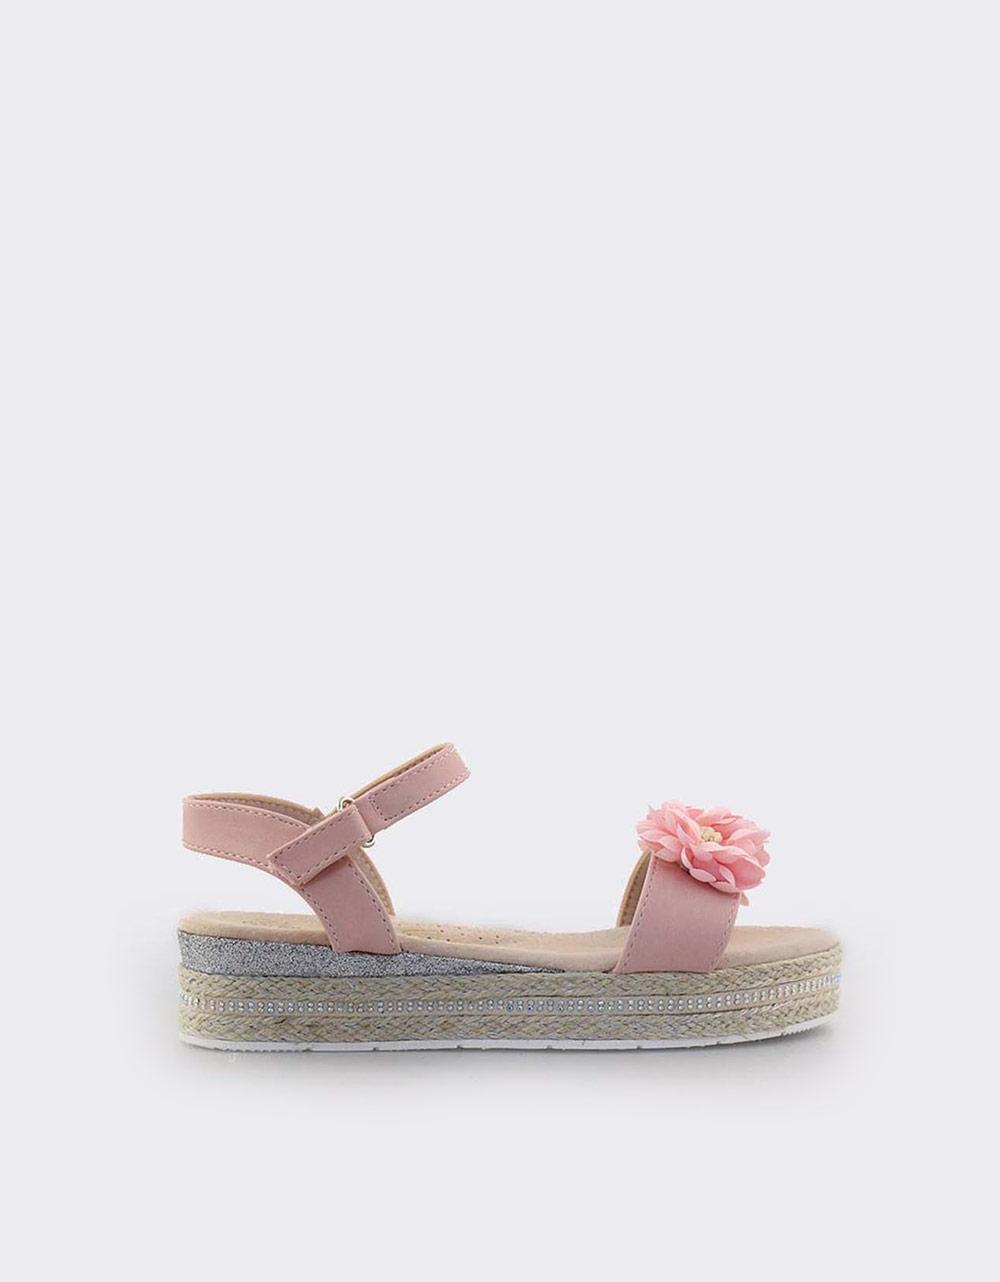 03d35aadeca Inshoes.gr. Παιδικά πέδιλα με λουλουδάκια | InShoes.gr Ροζ